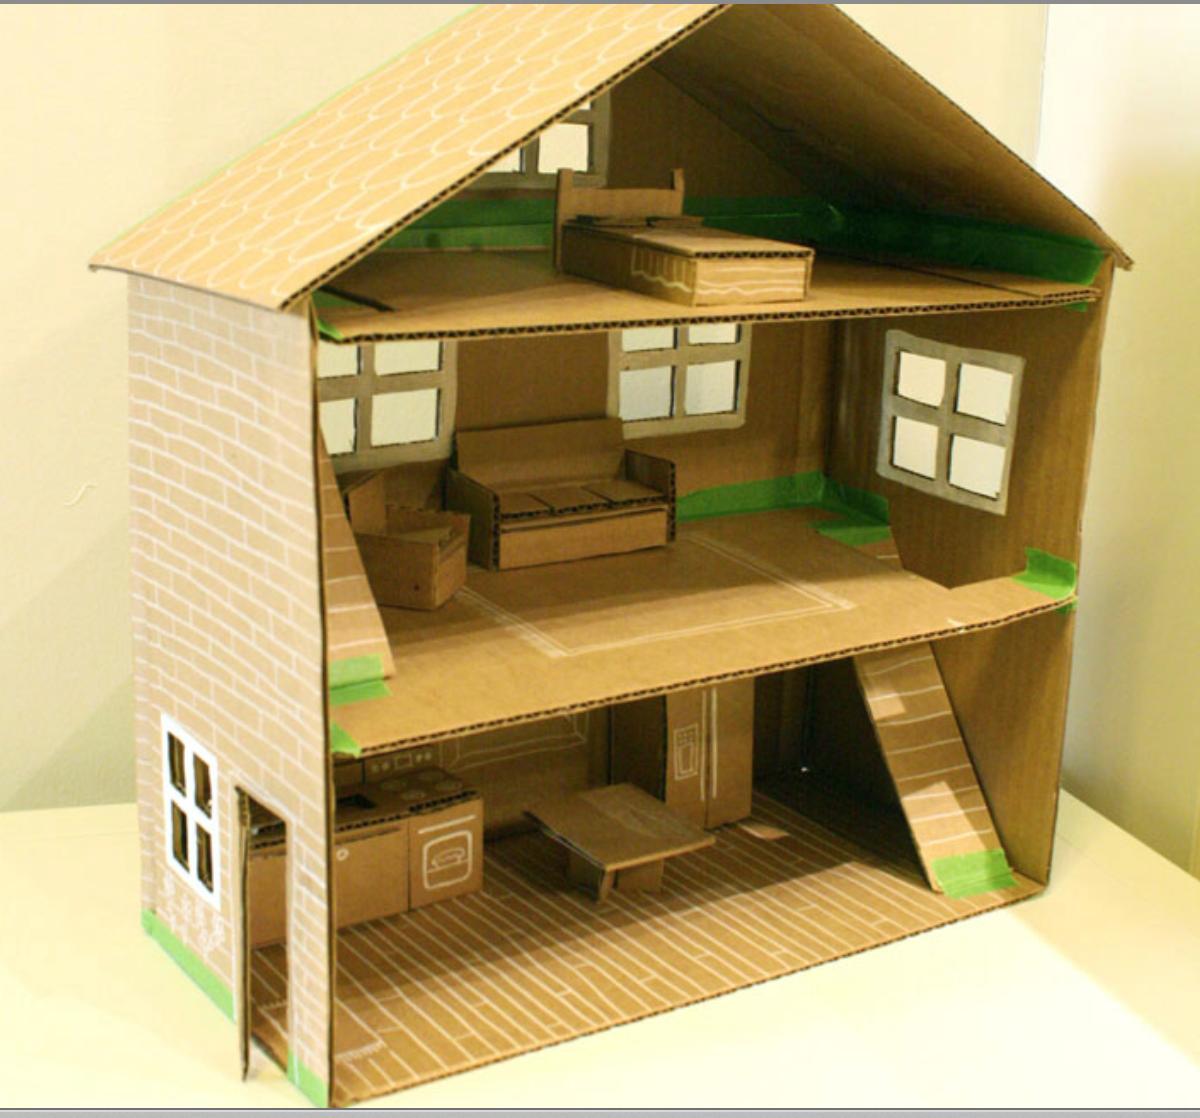 meggiecat: DIY Cardboard Box Toy House